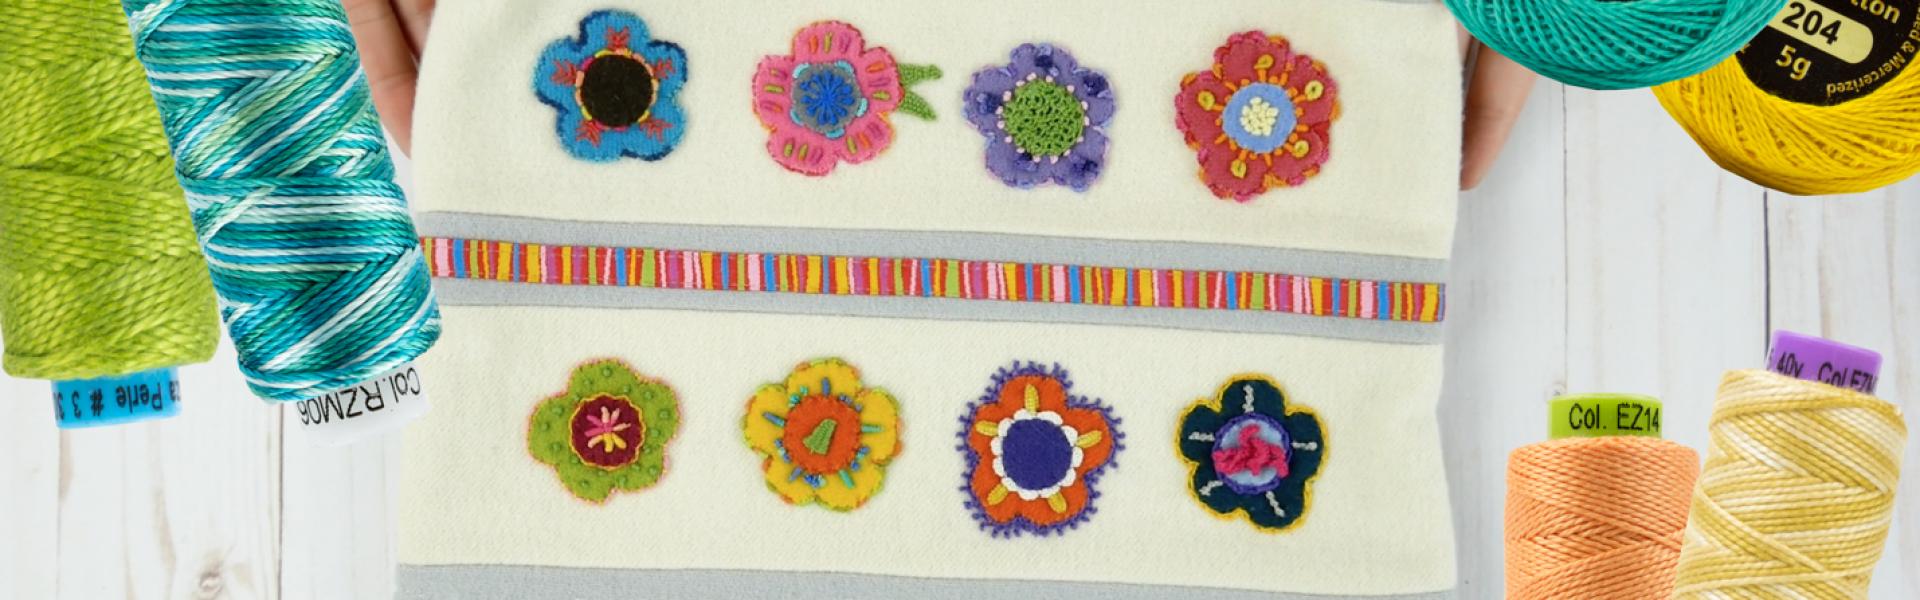 Choosing the Best Hand Embroidery Thread   WonderFil Australia